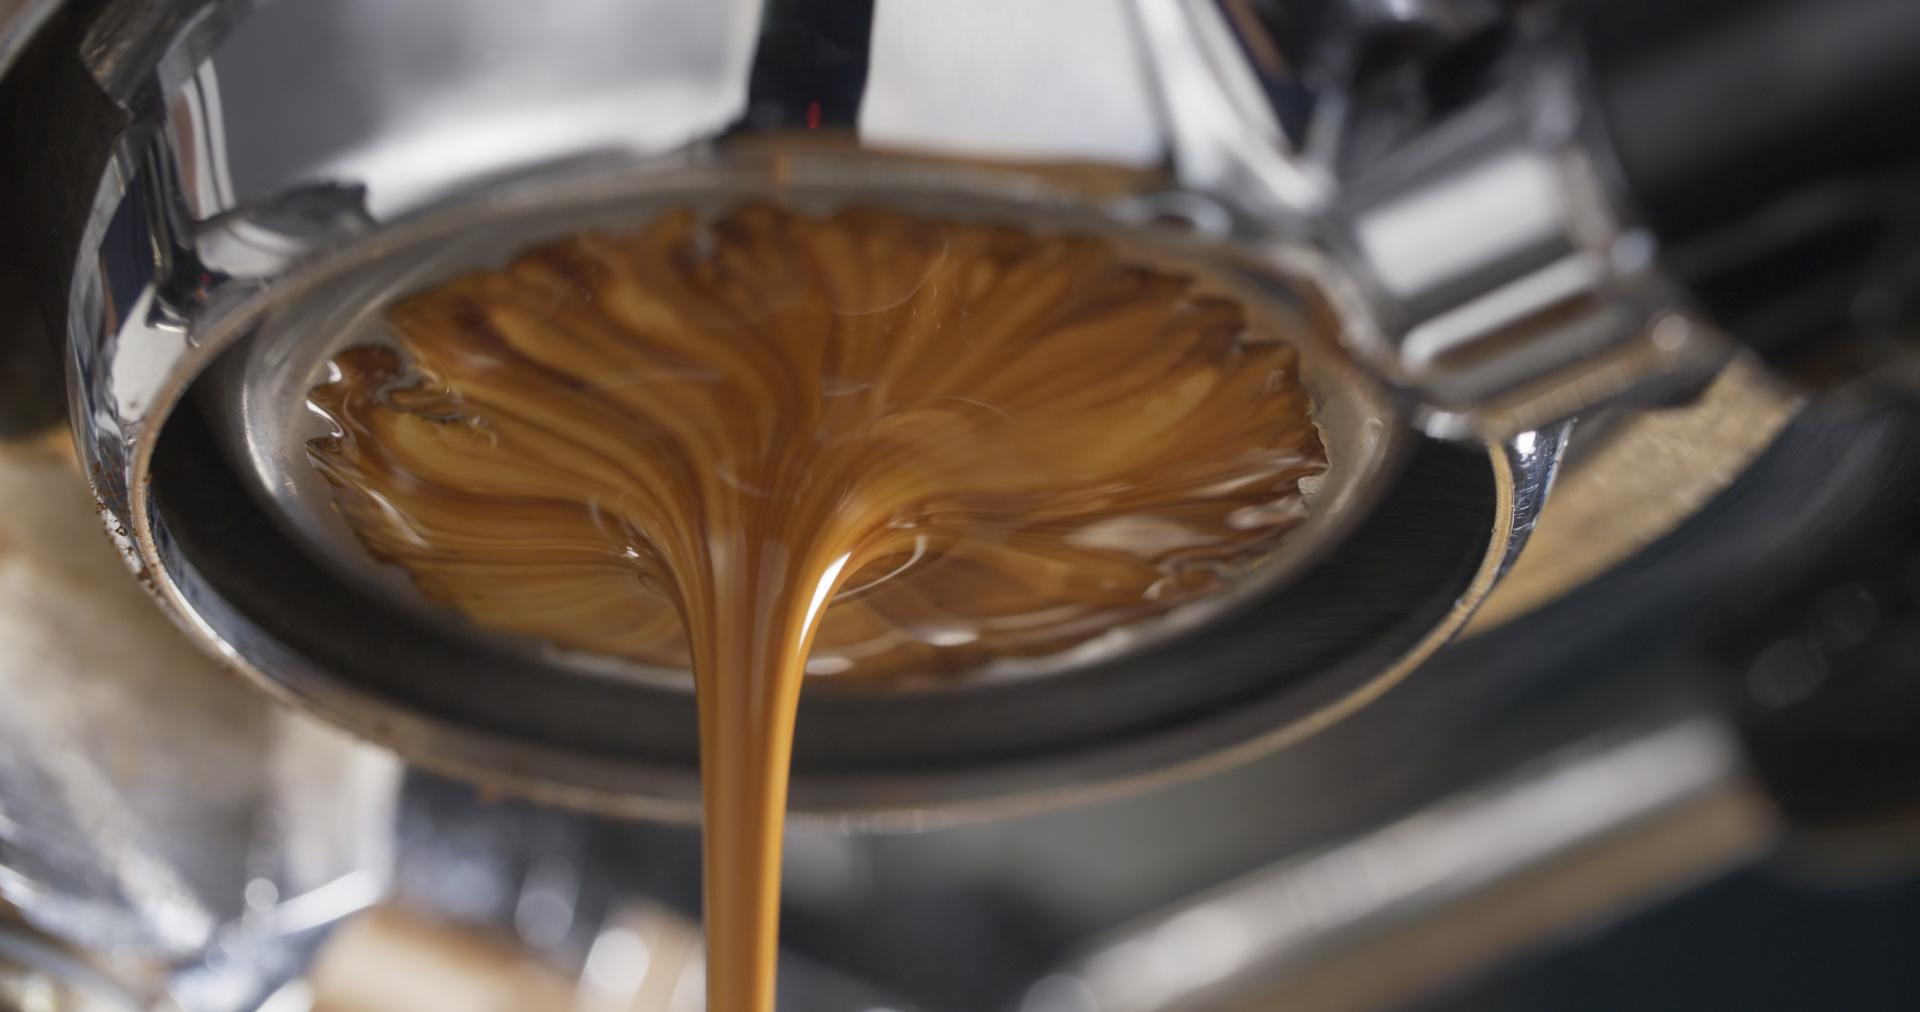 coffee repair, espresso repair, coffee machines, espresso machines, coffee machine repair in Los Angeles, coffee machine repair in riverside, coffee machine repair in palm springs, espresso maker repair